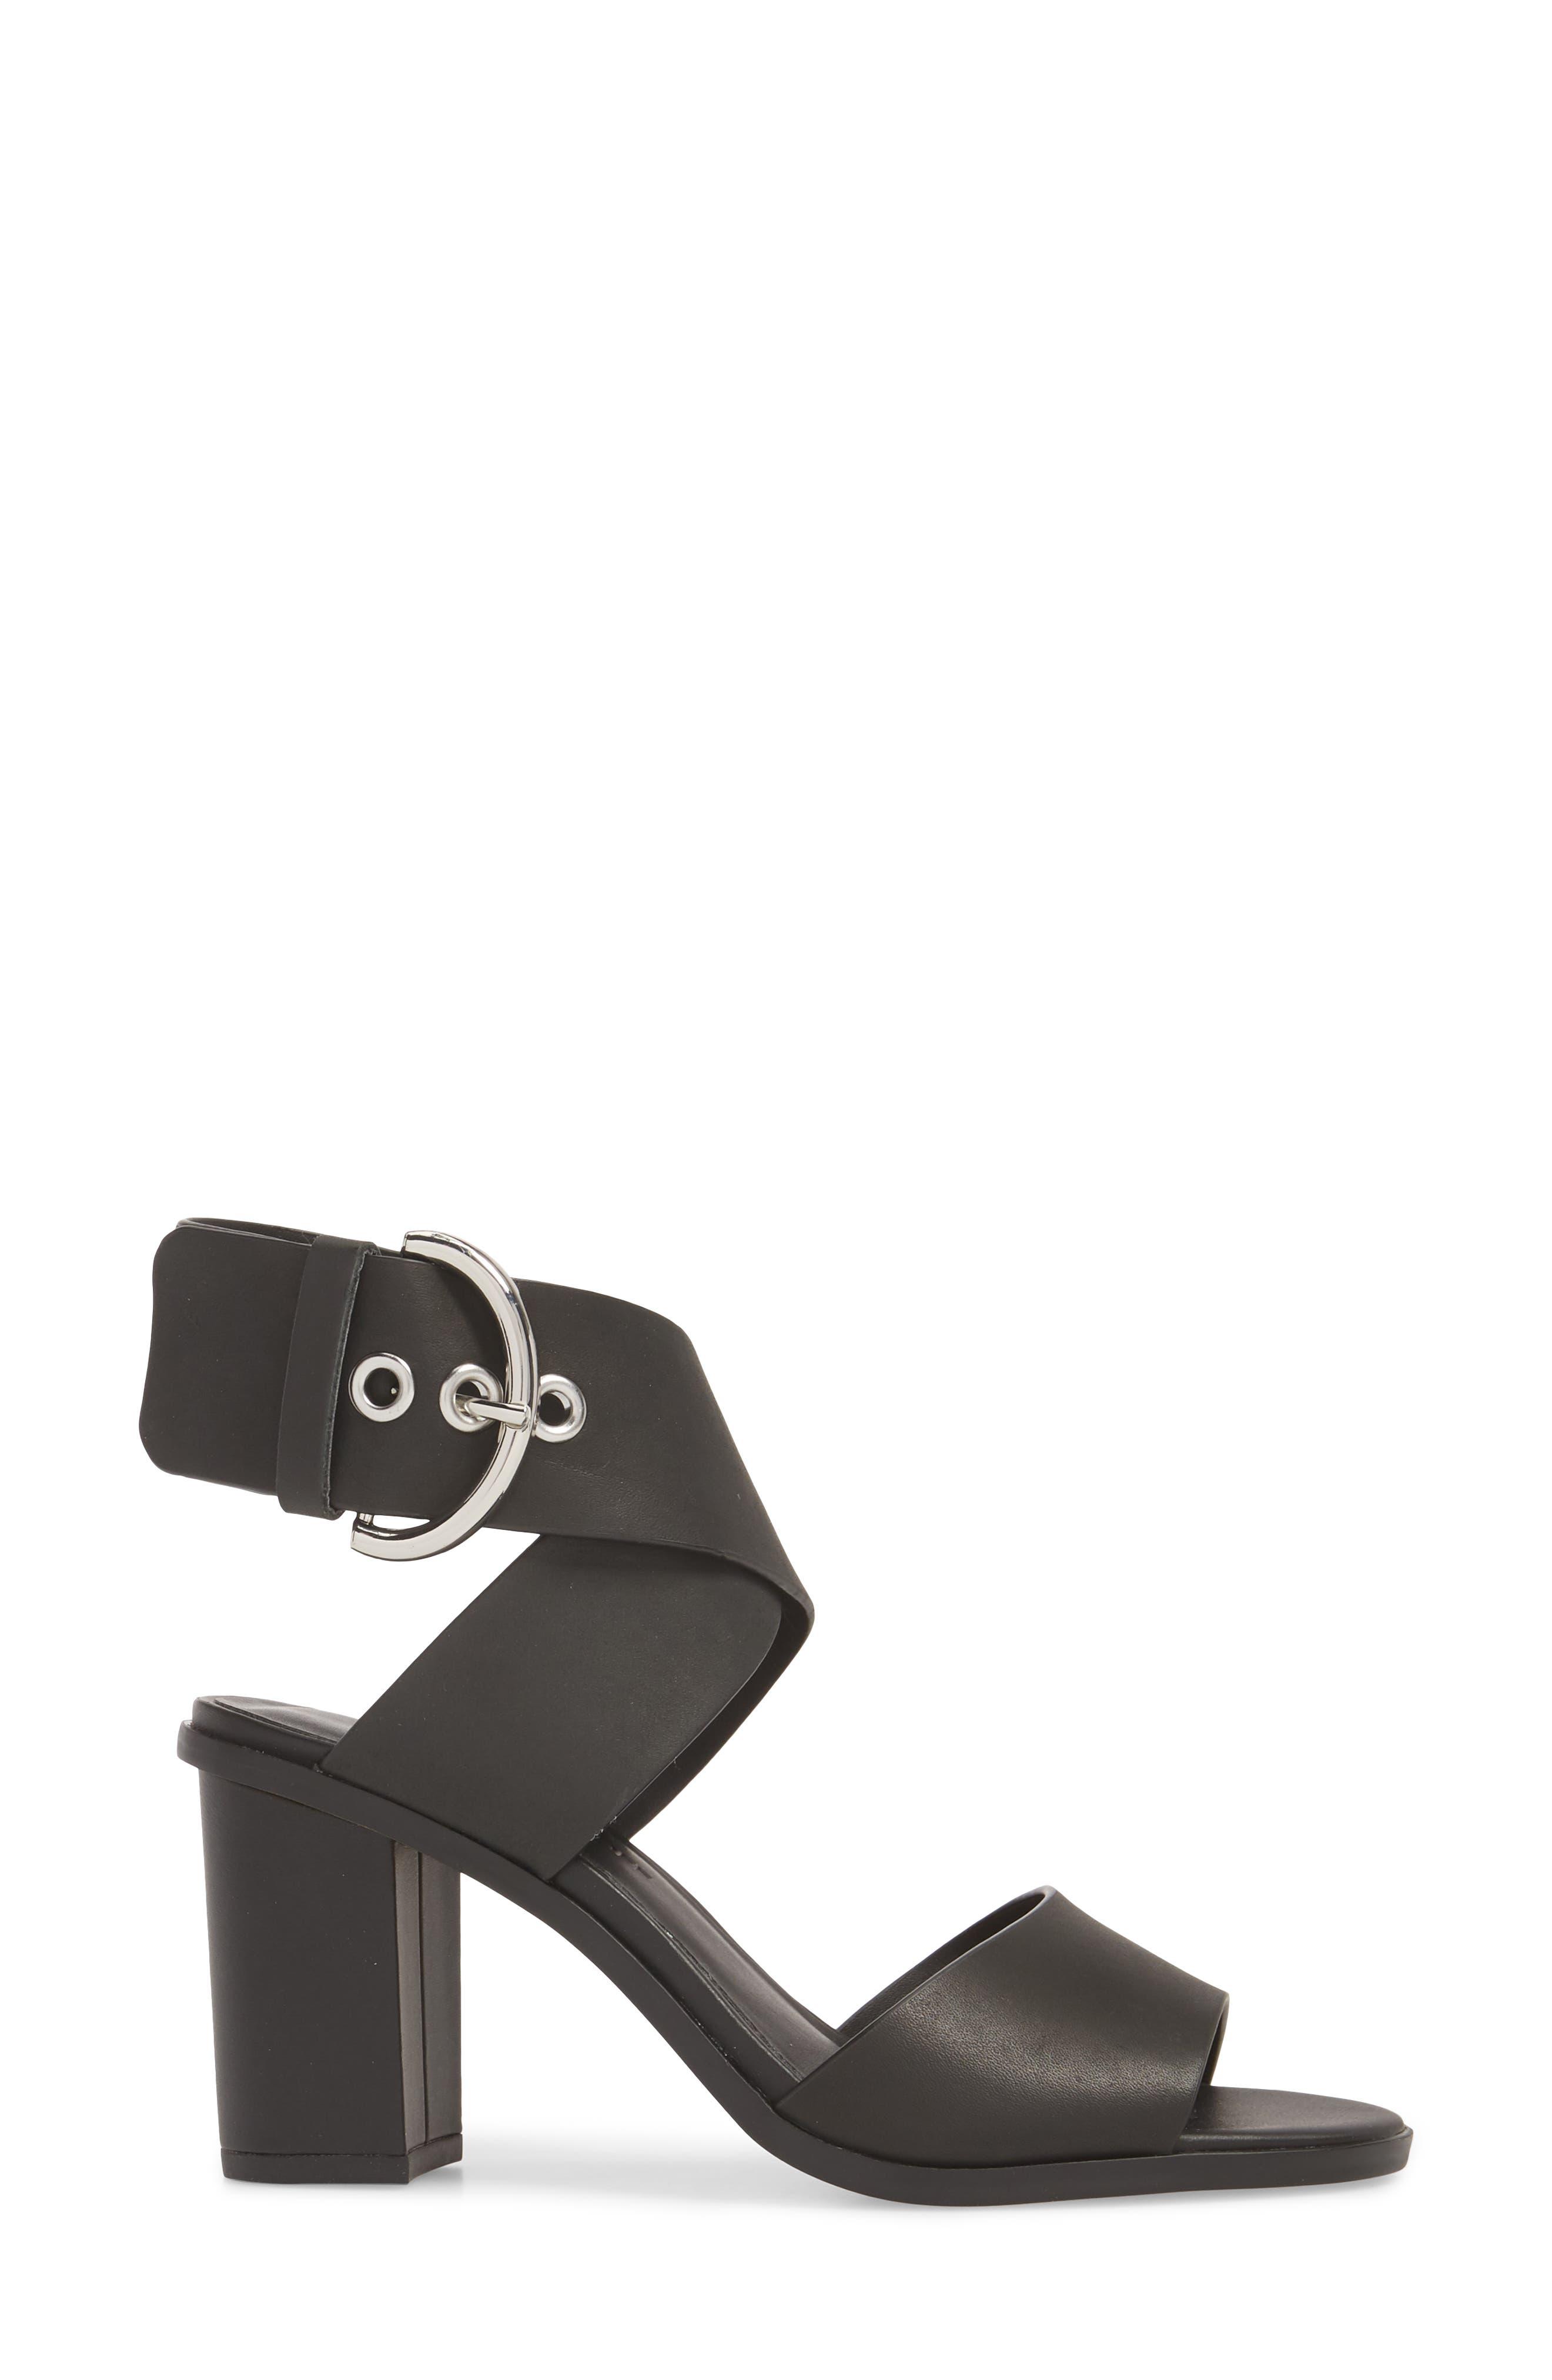 Valaree Sandal,                             Alternate thumbnail 3, color,                             Black Leather